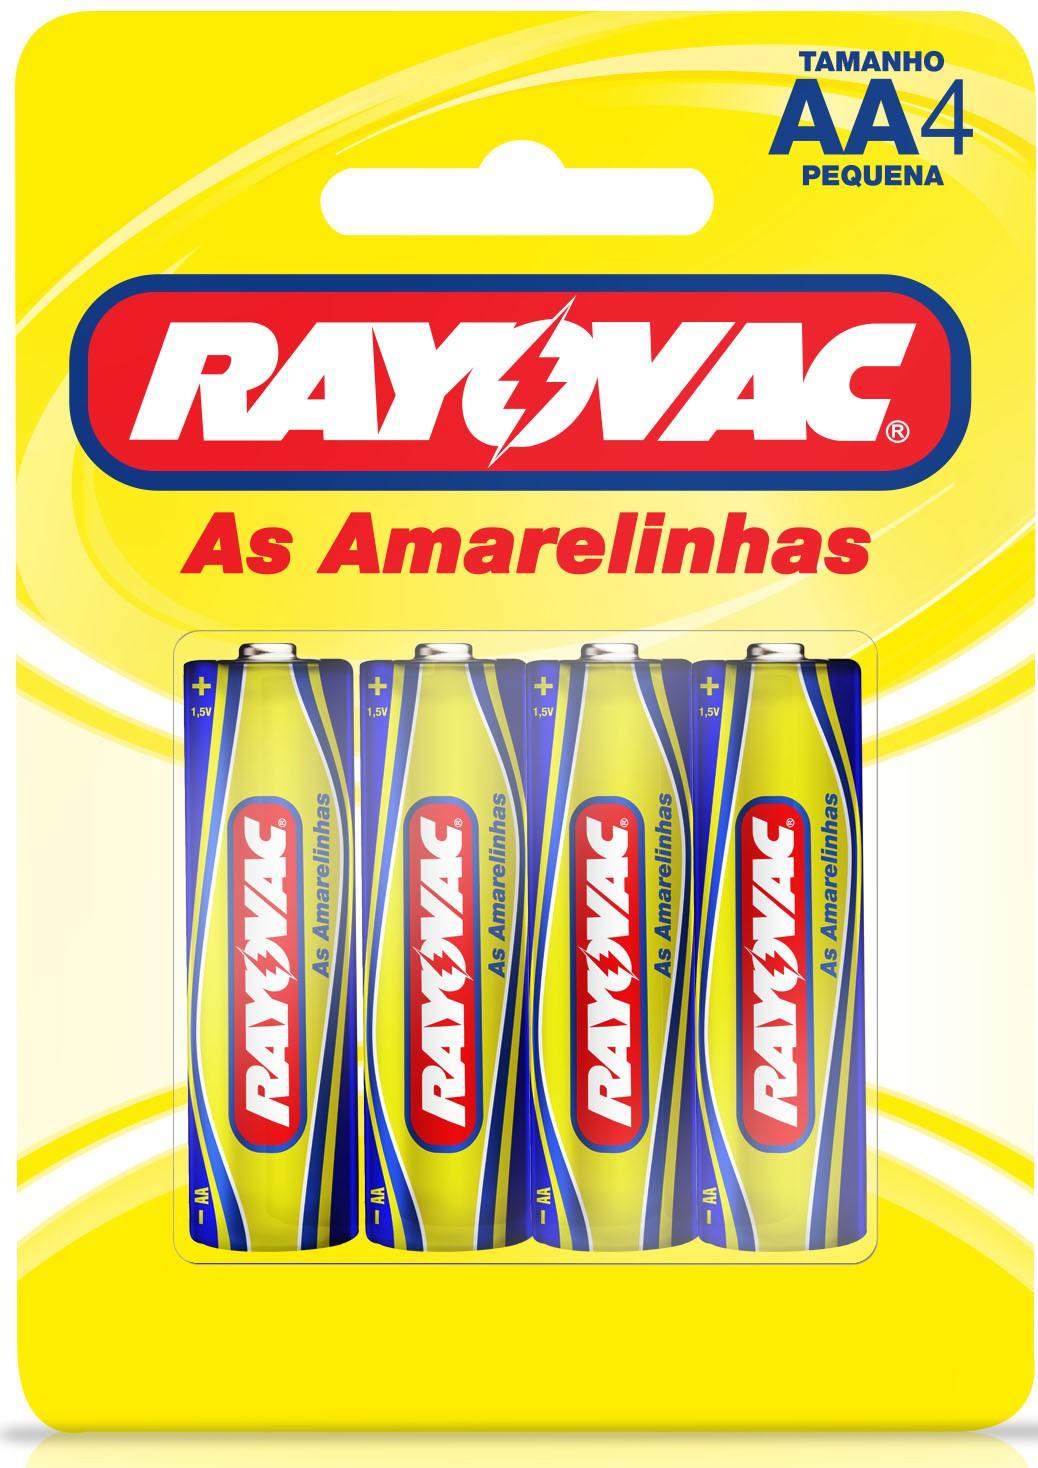 20 Pilhas AA Zinco Carvão RAYOVAC 5 cartelas